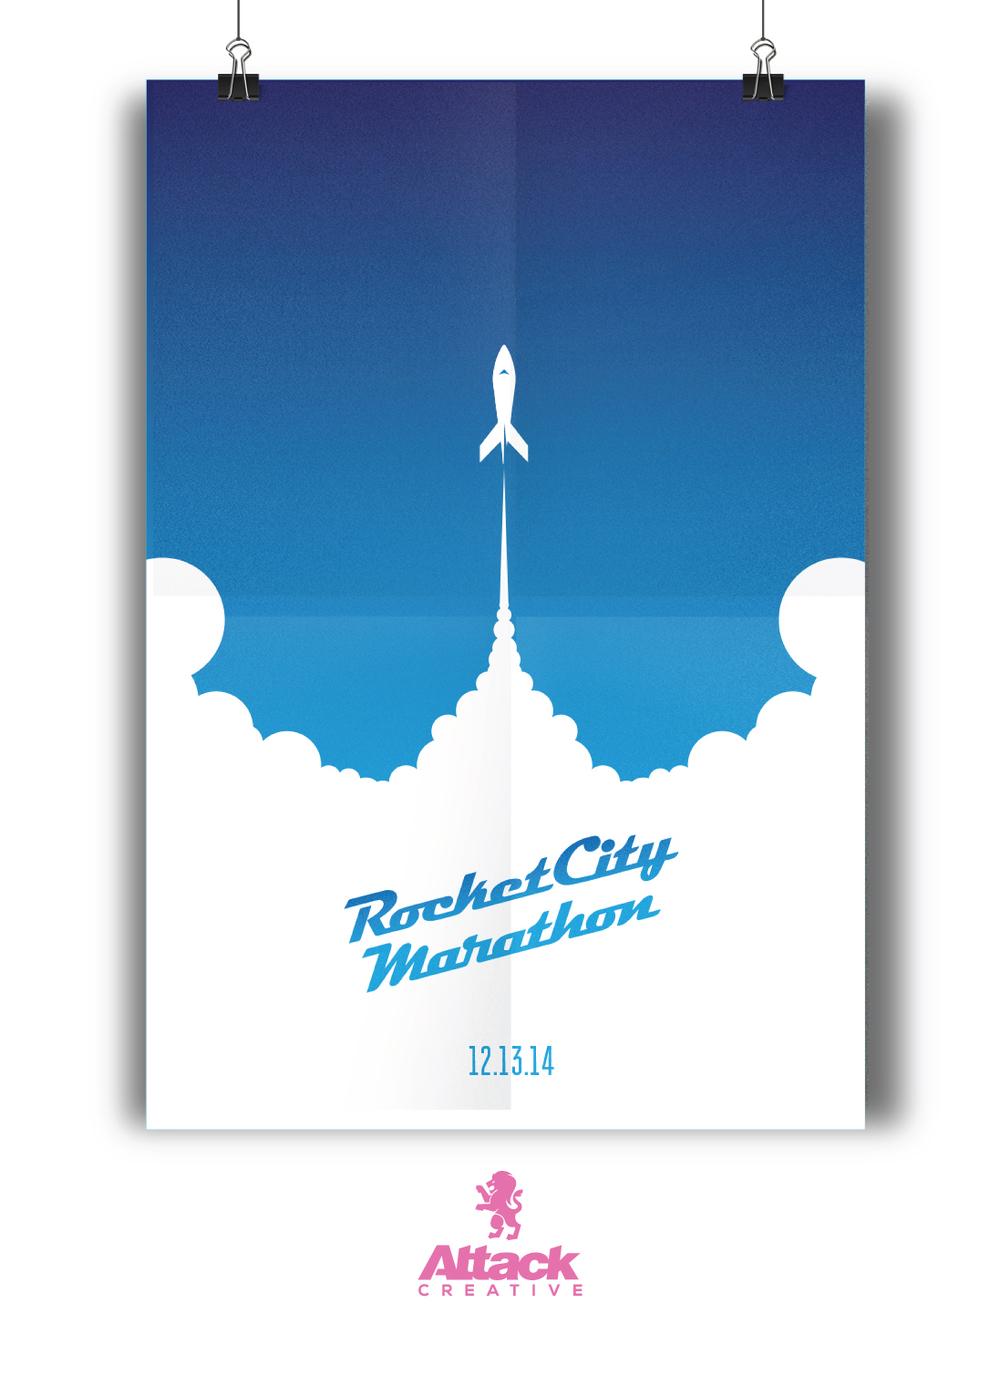 Rocket-City-Marathon-poster-mockup.jpg